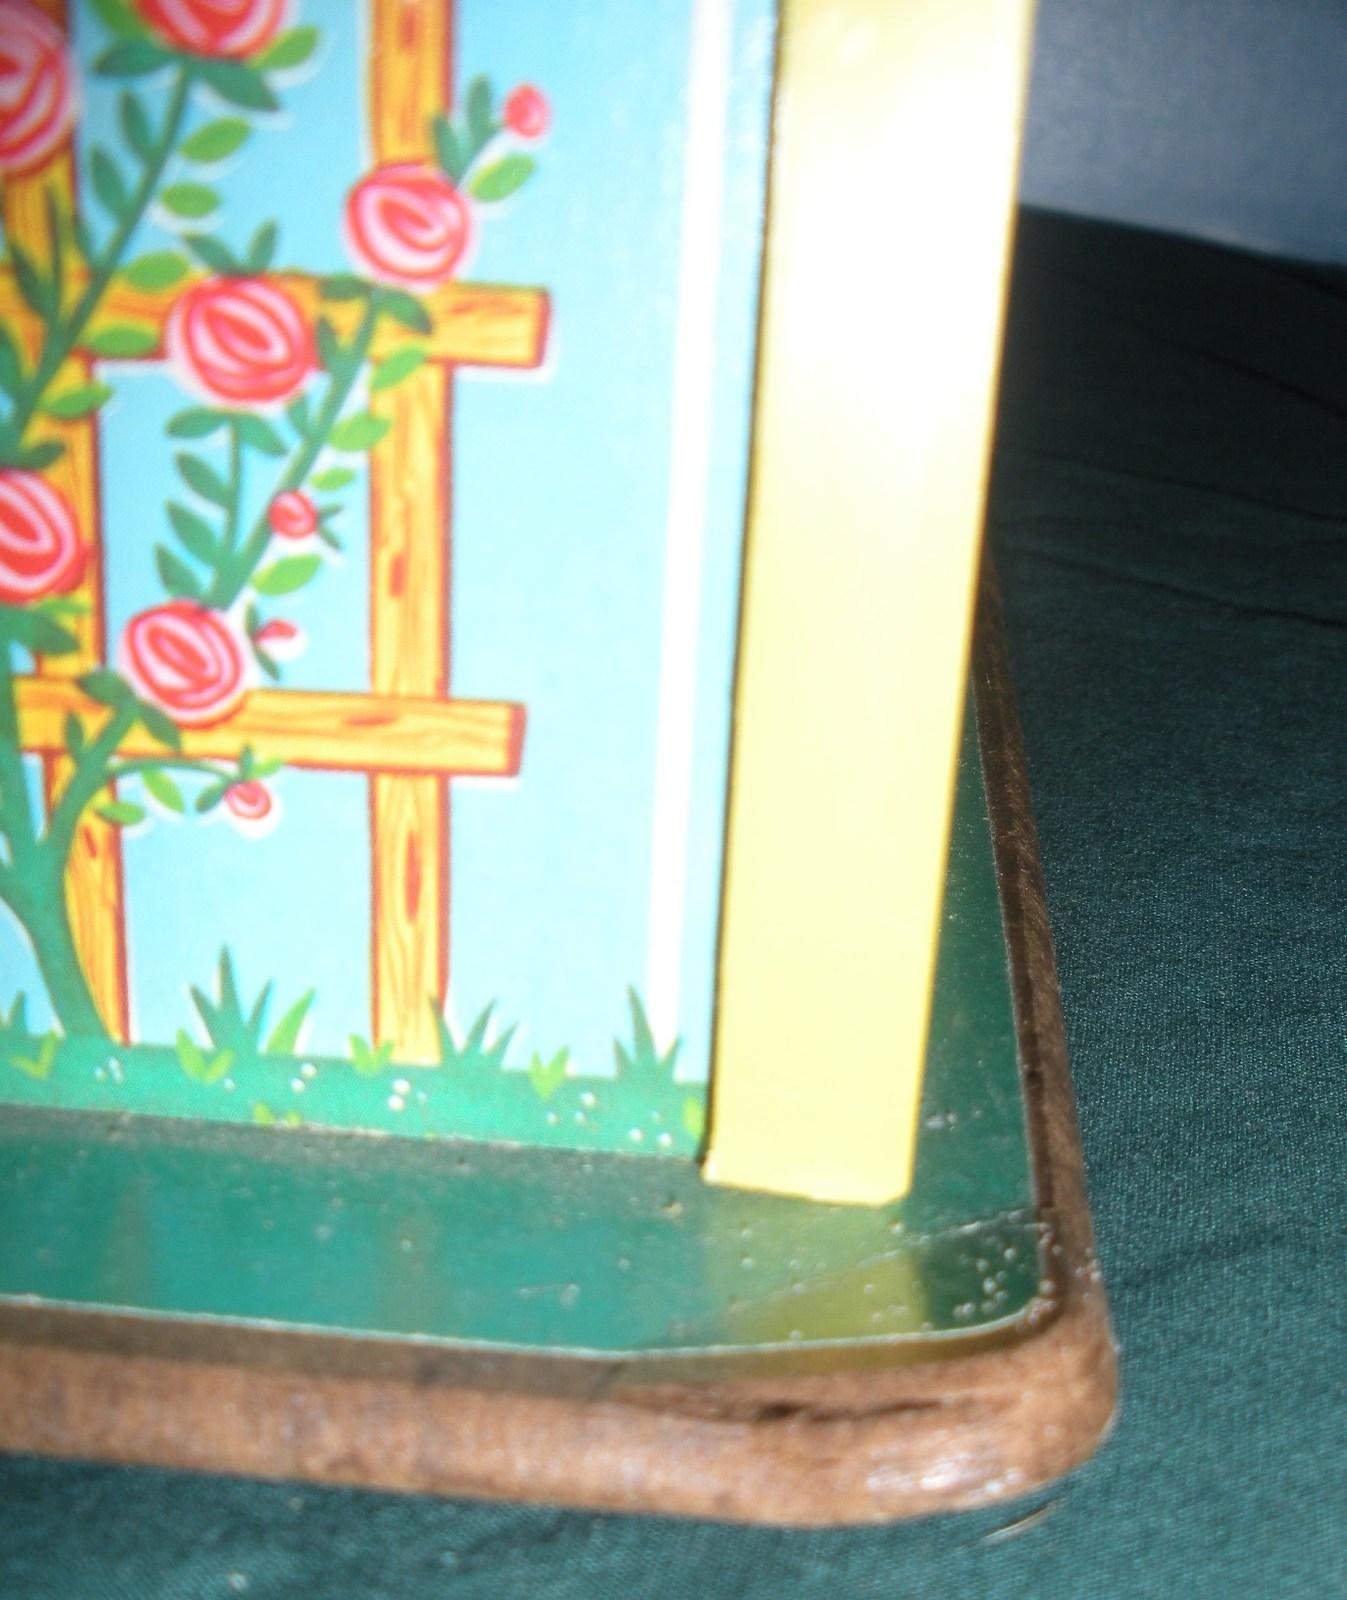 Vtg. Fisher Price Little People #952 Yellow House Comp.+ BONUS/ EXC++-NR MT  (P) image 6